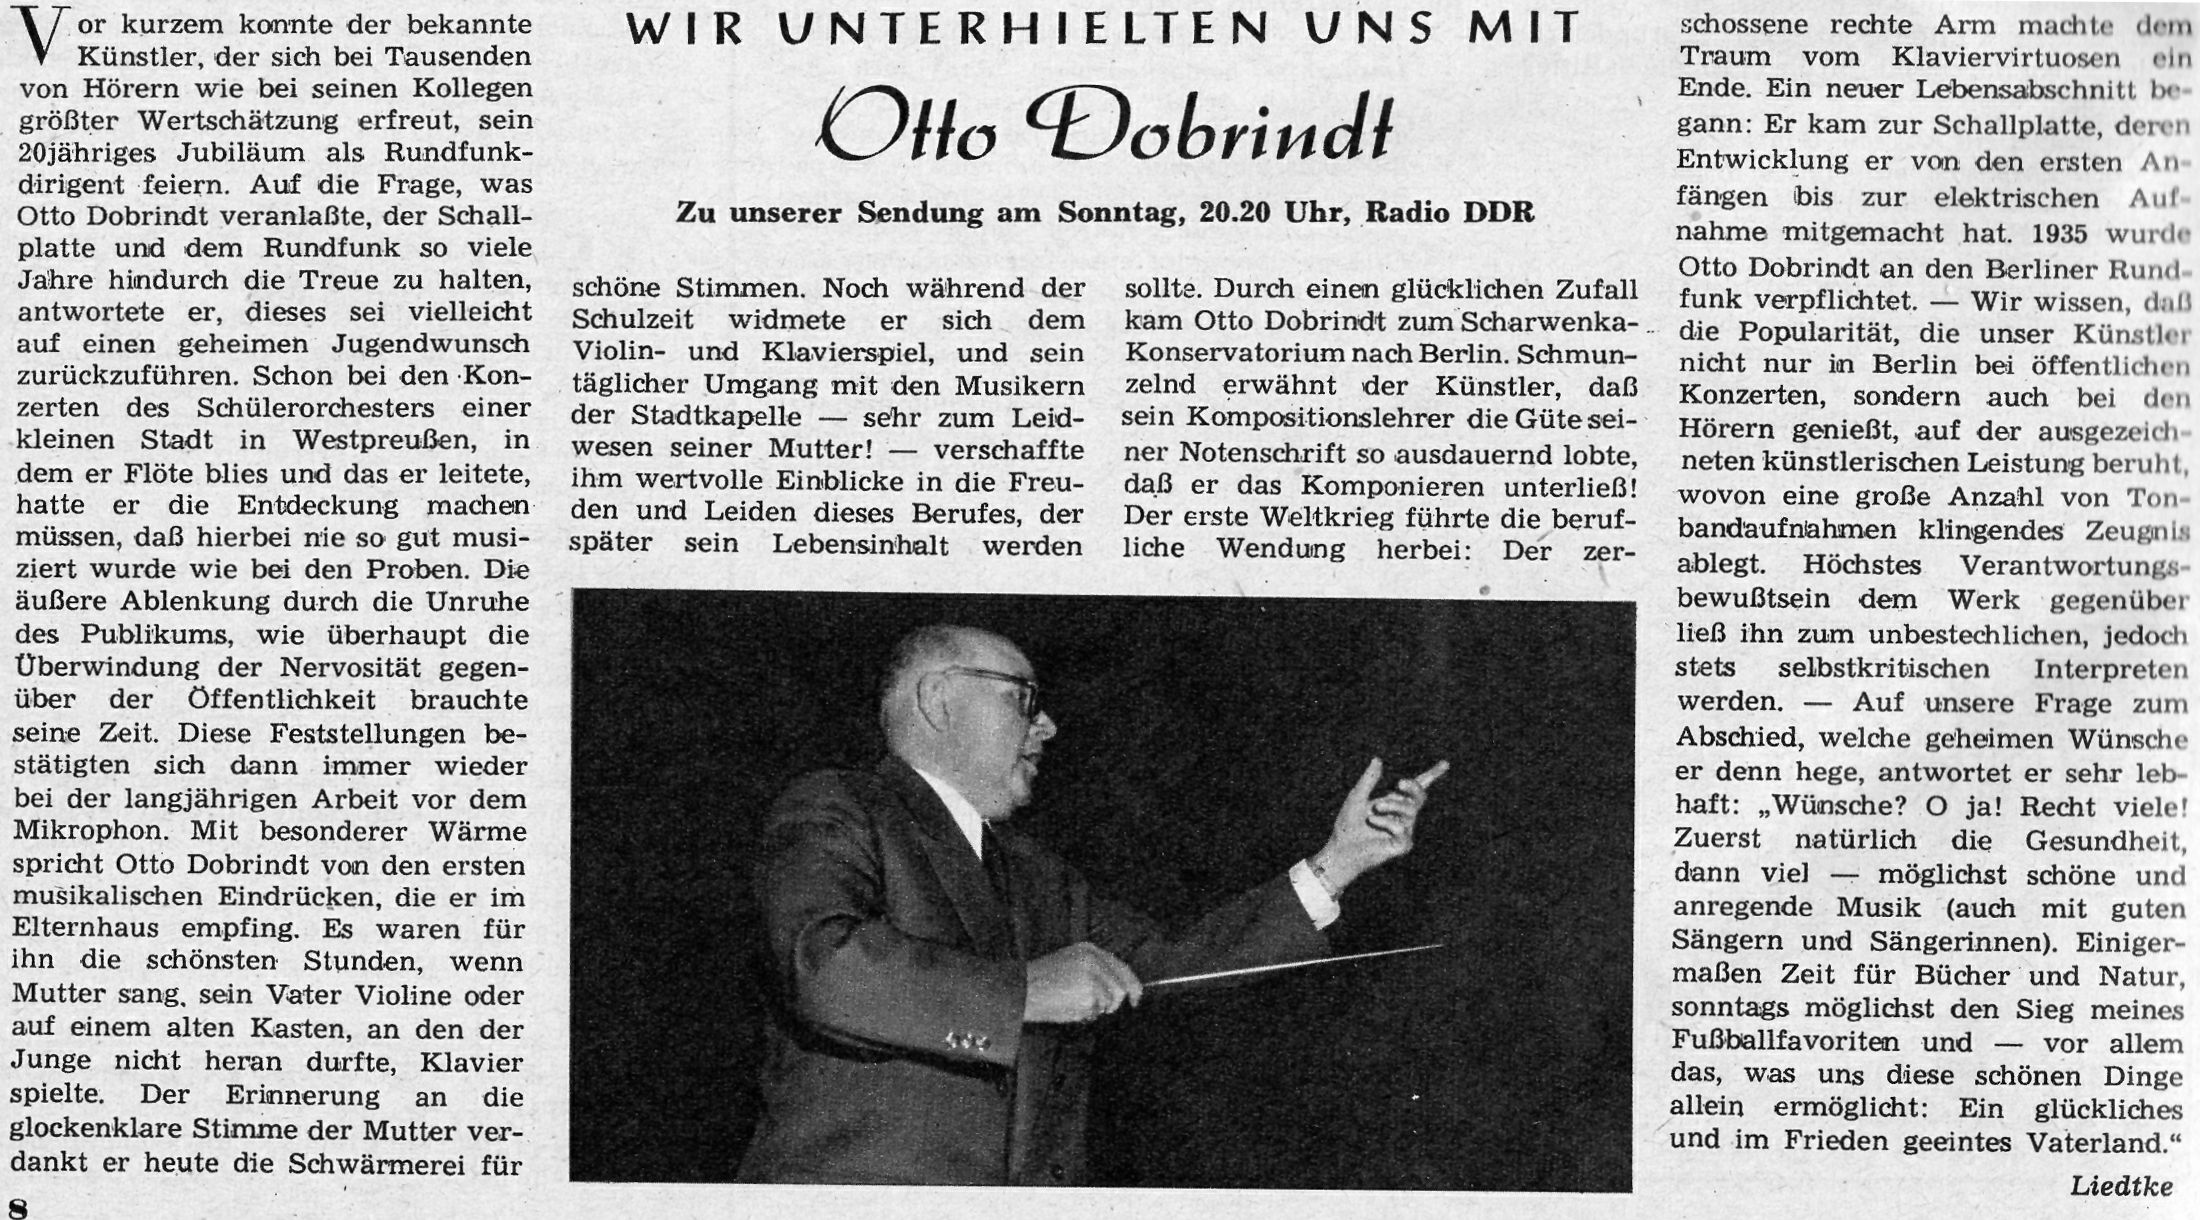 Saxophon-Orchester Dobbri - Wer Hat Bloß Den Käse Zum Bahnhof Gerollt? / Negers Liebling